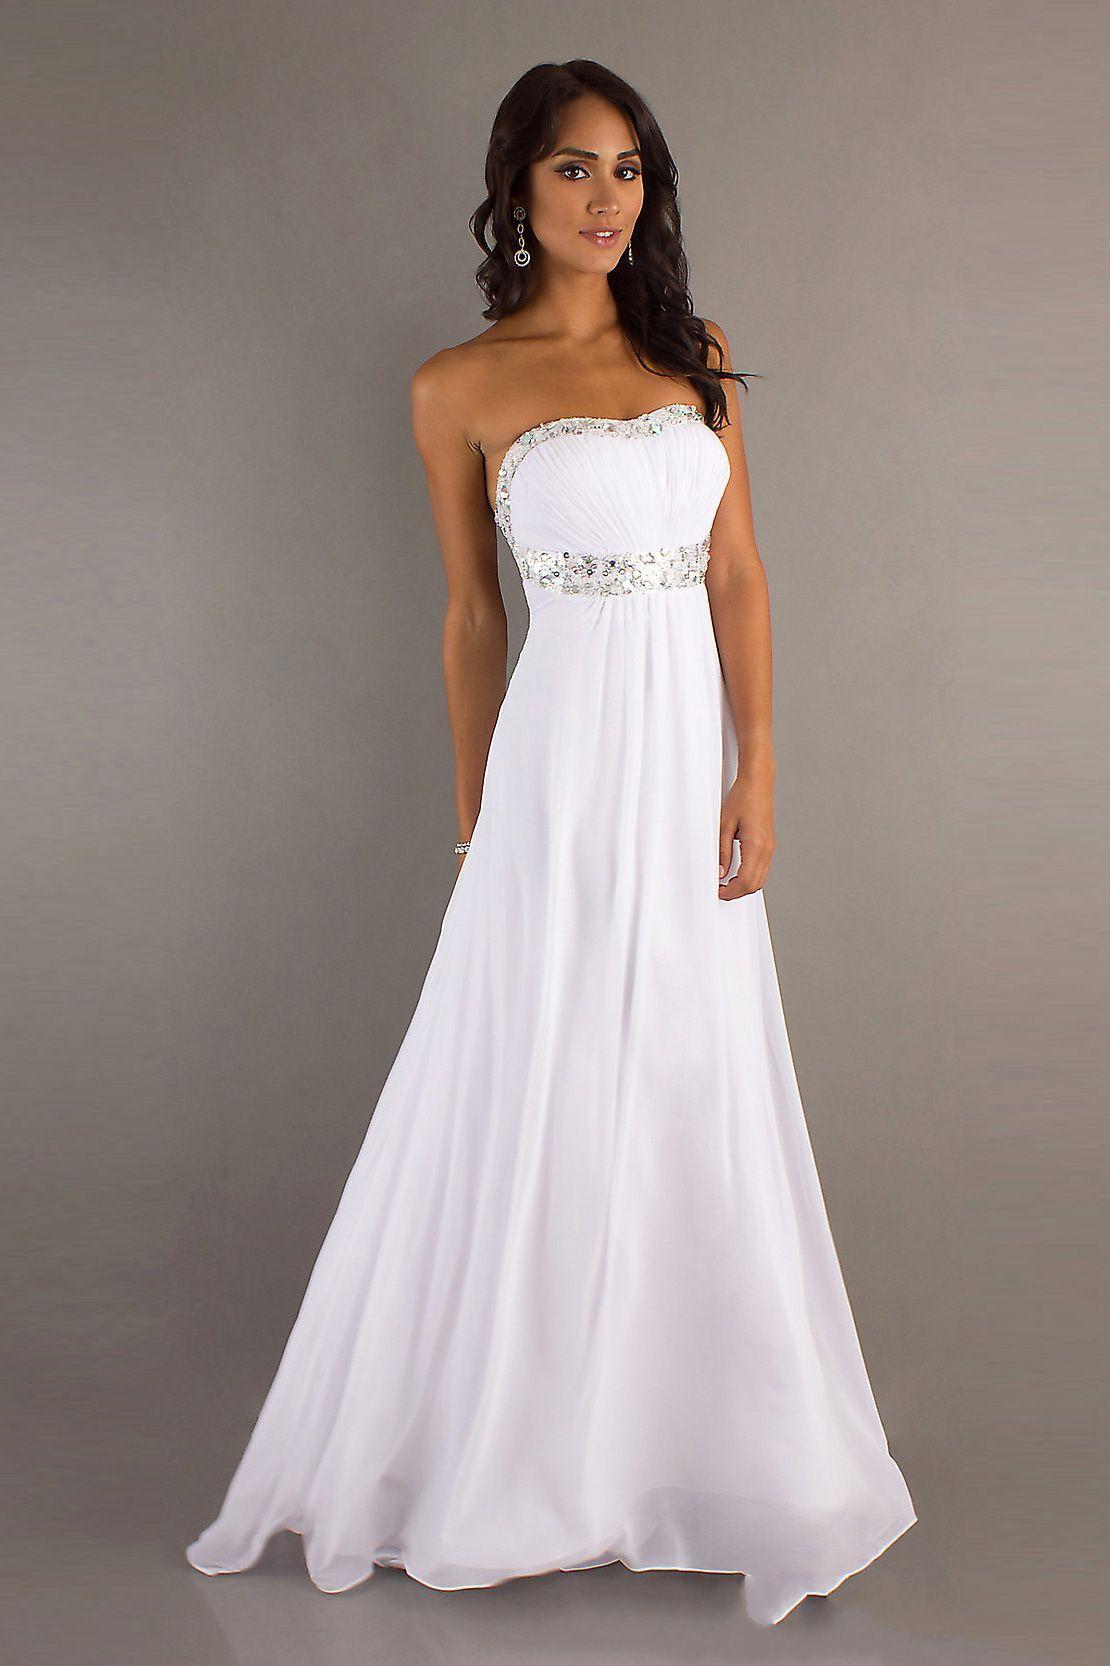 Prom Dresses   ... Prom Dress 2013 UK,Fast Shipping Beaded ...